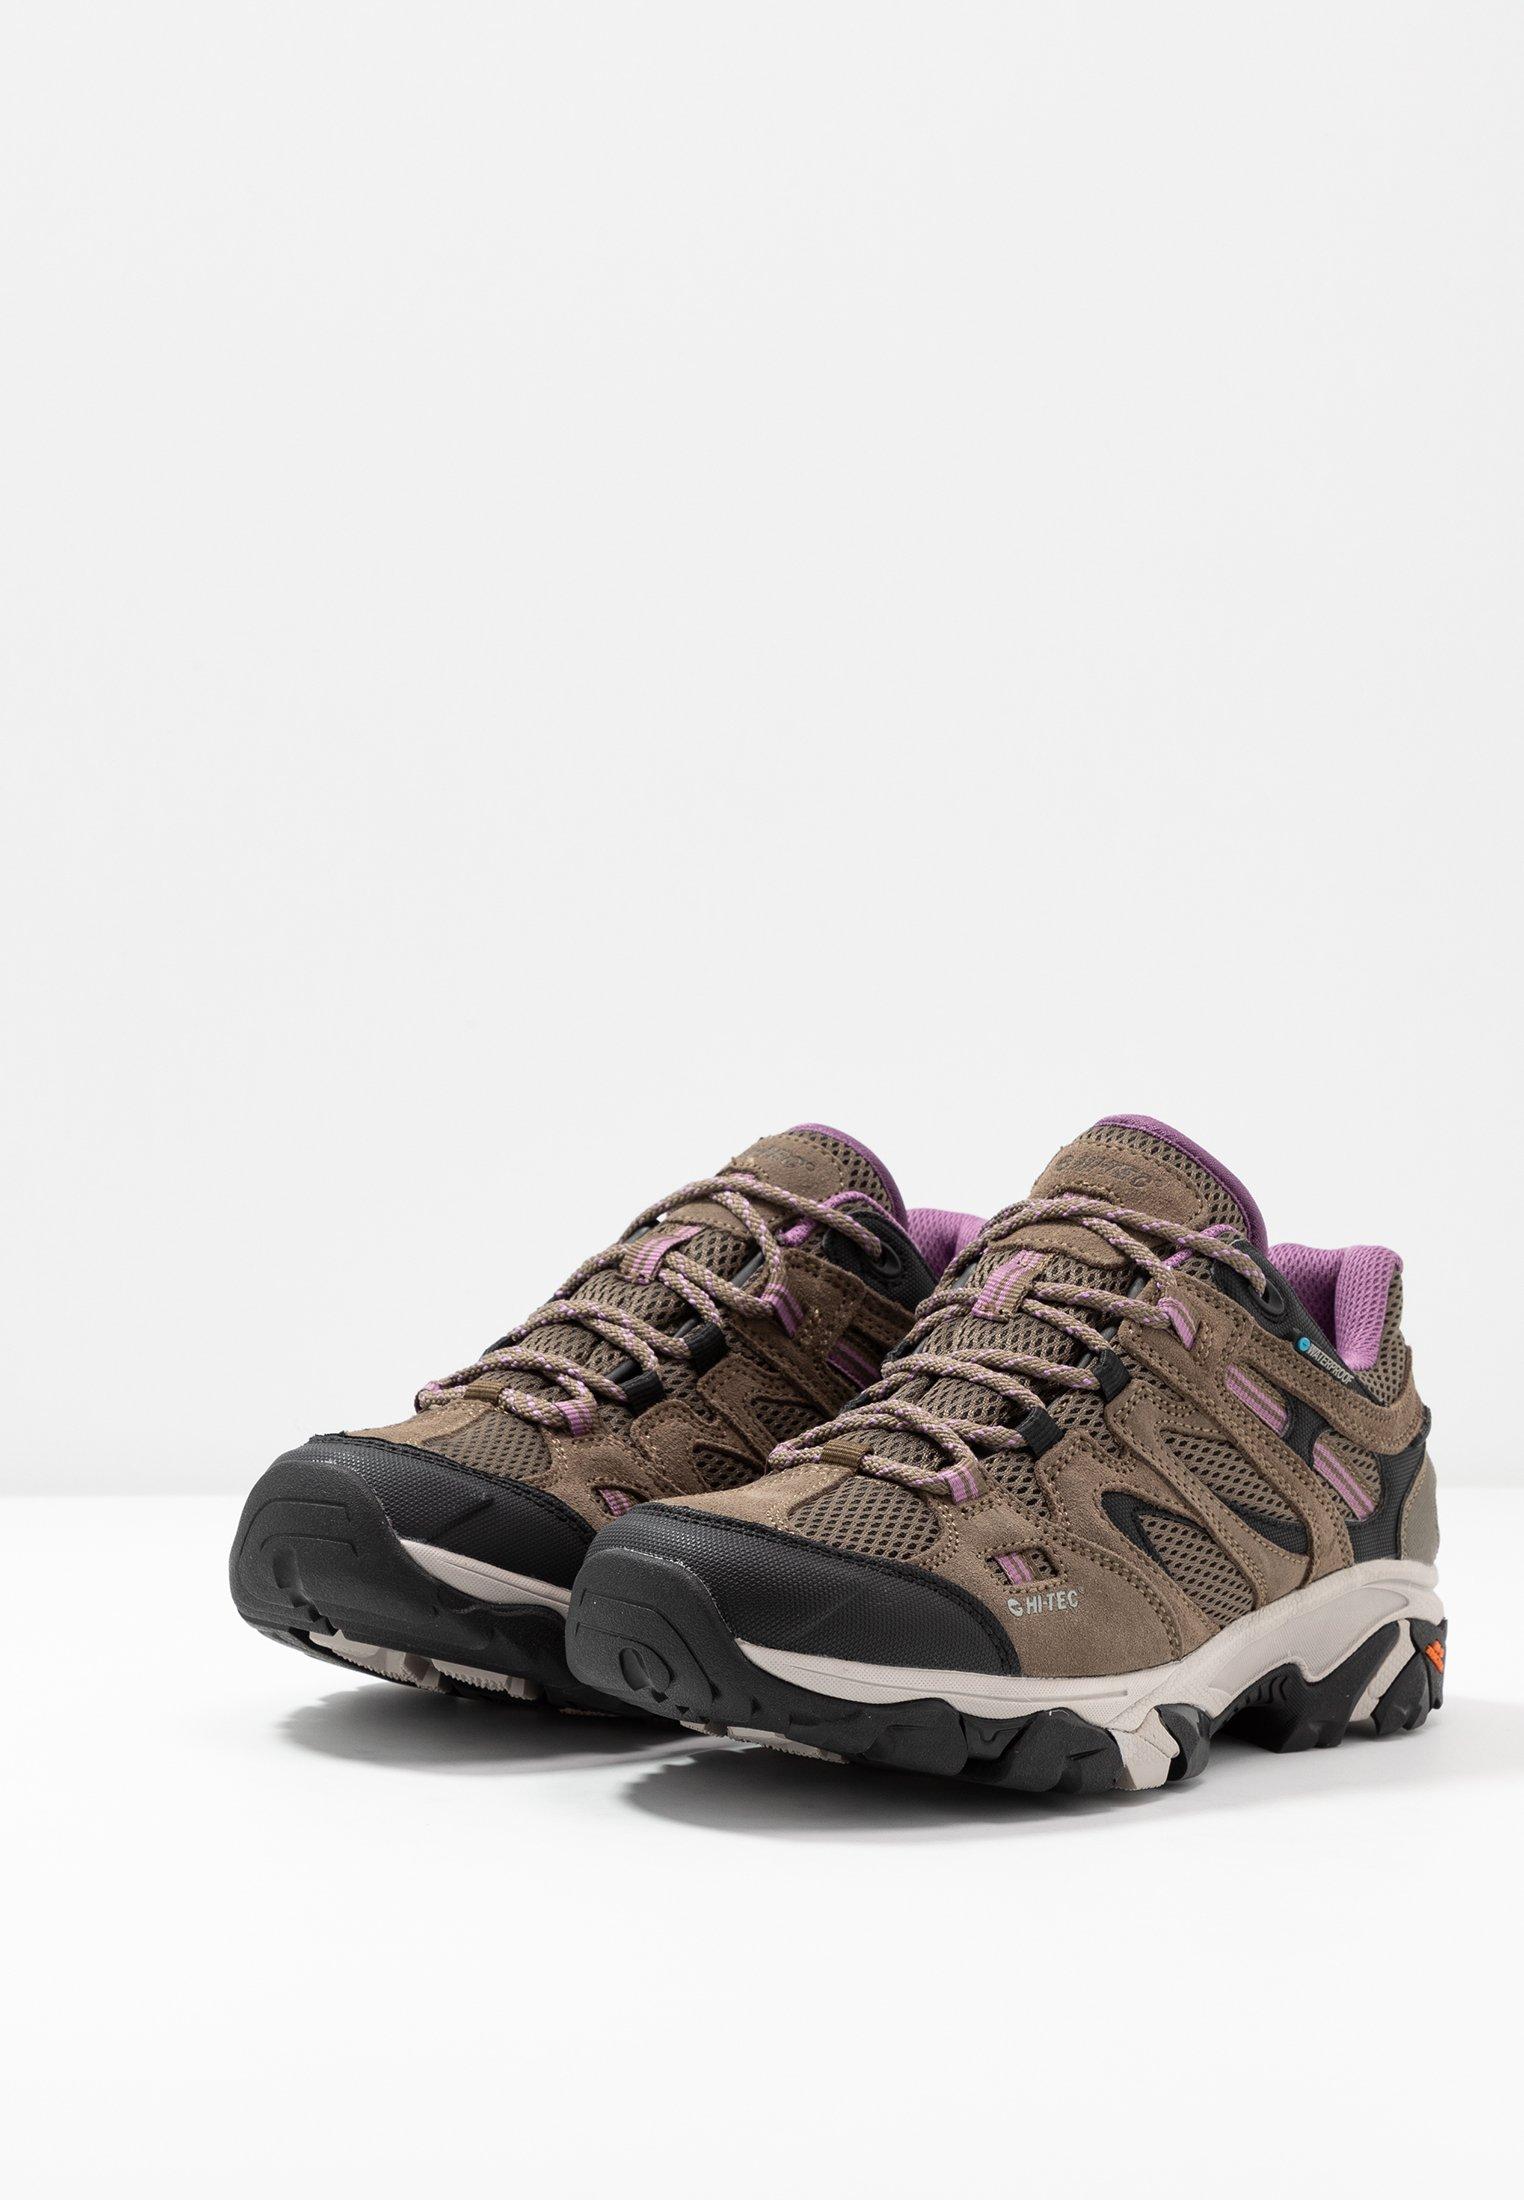 Hi-Tec RAVUS VENT LOW WP WOMENS - Hikingschuh - smokey brown/taupe/very grape - Black Friday